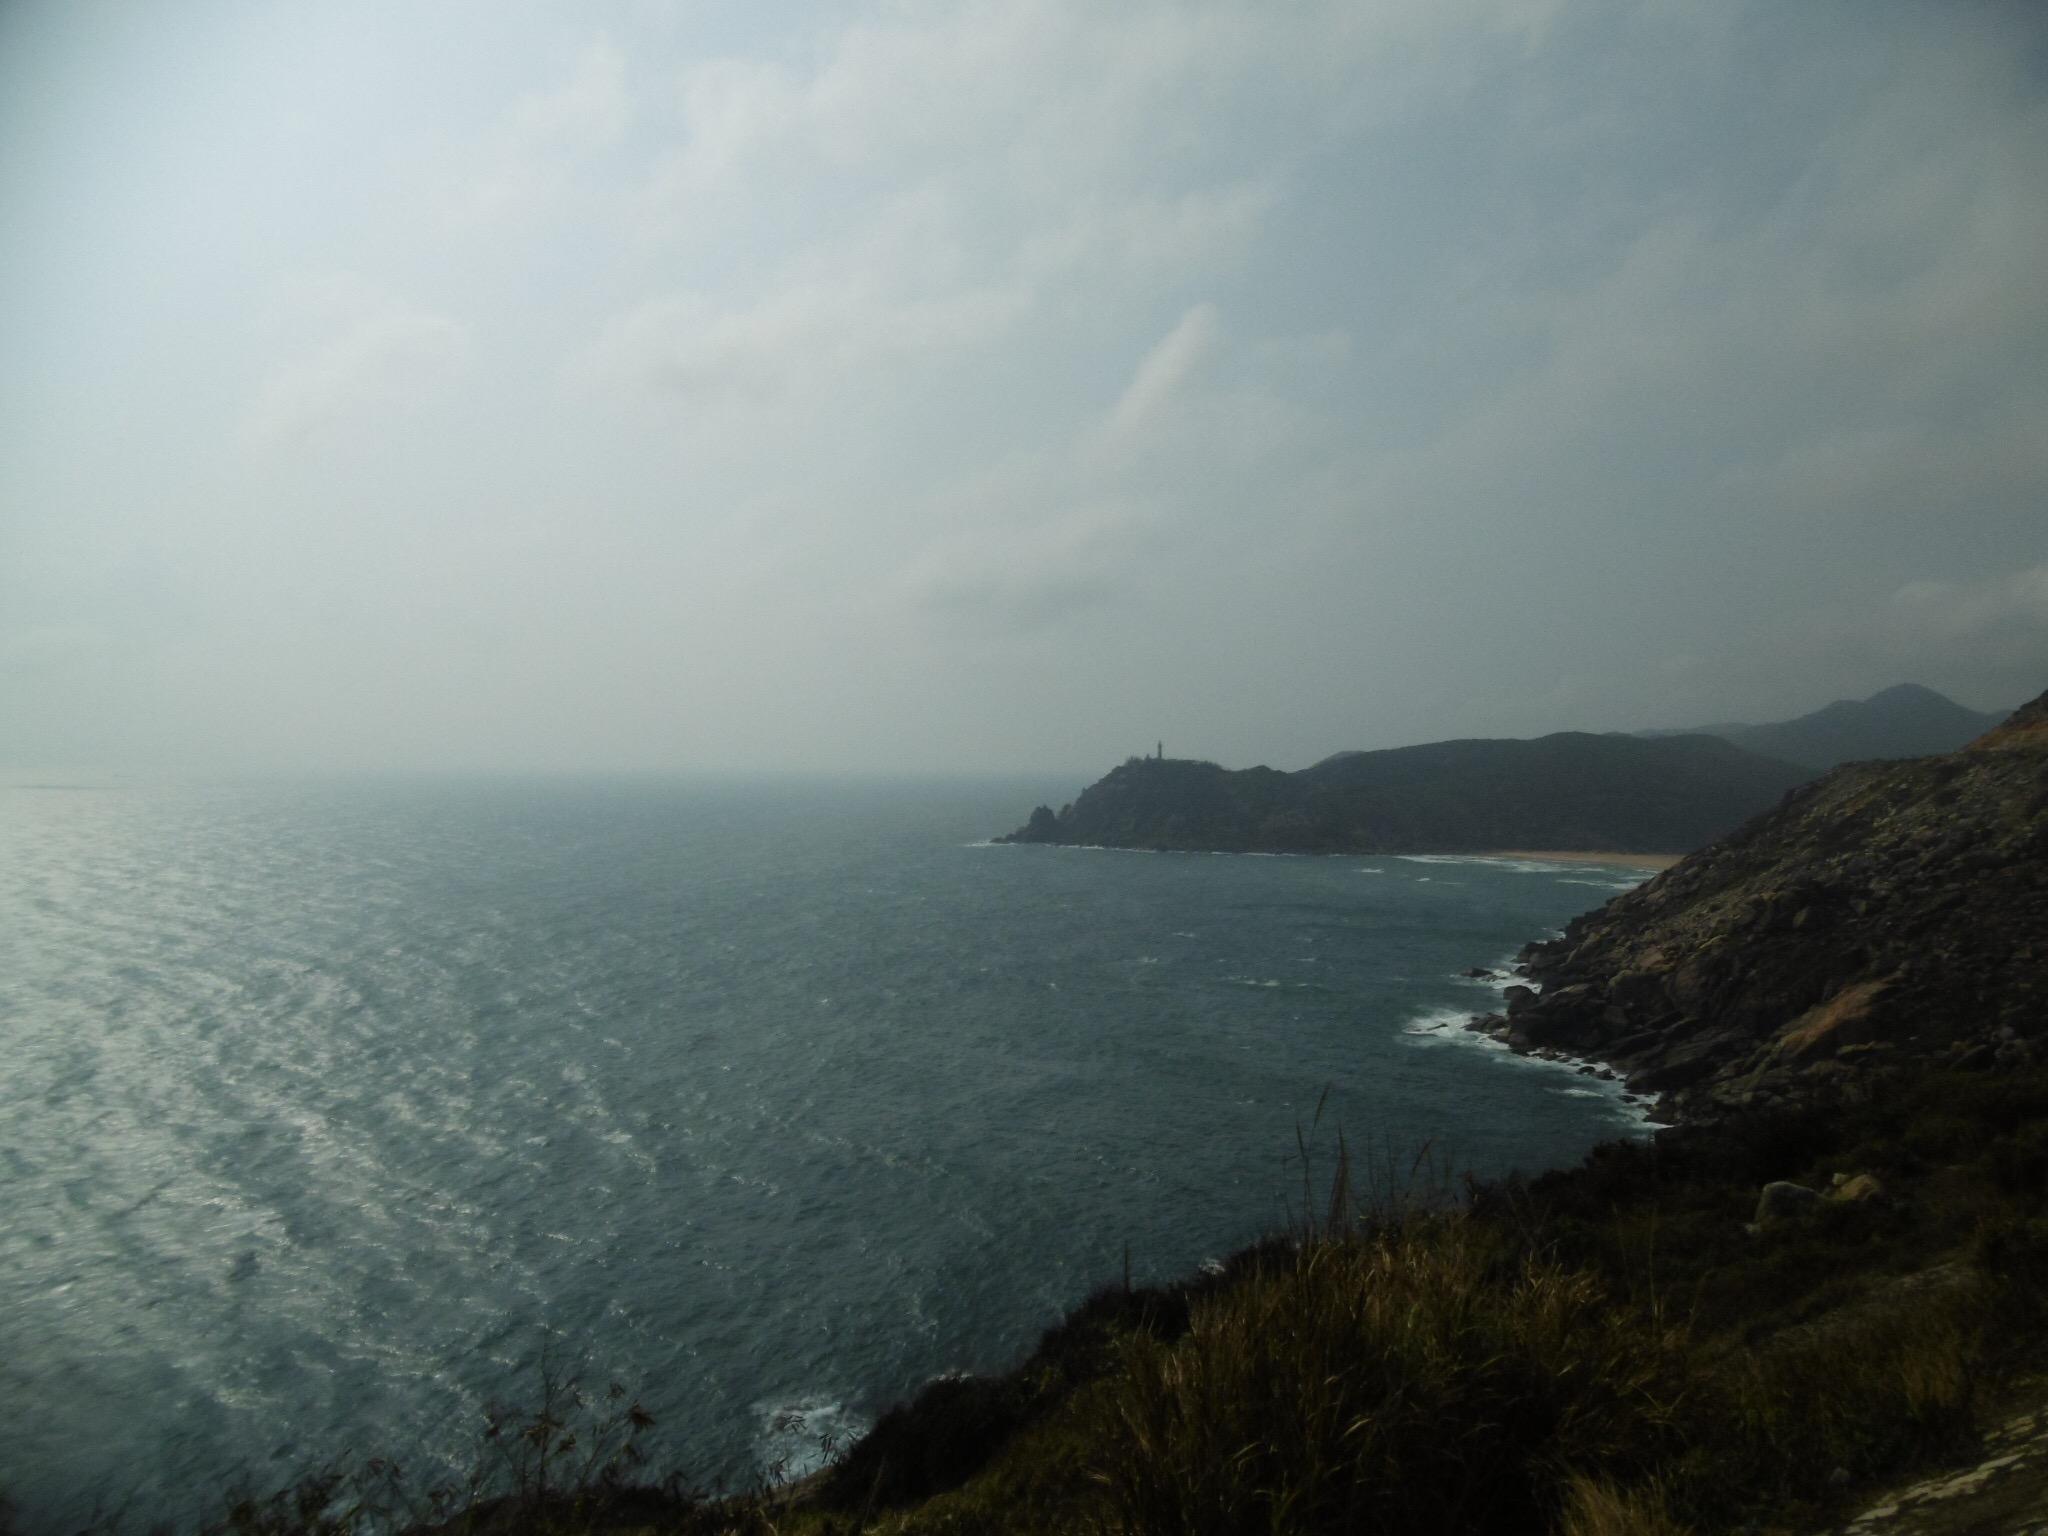 The coastline of South Vietnam